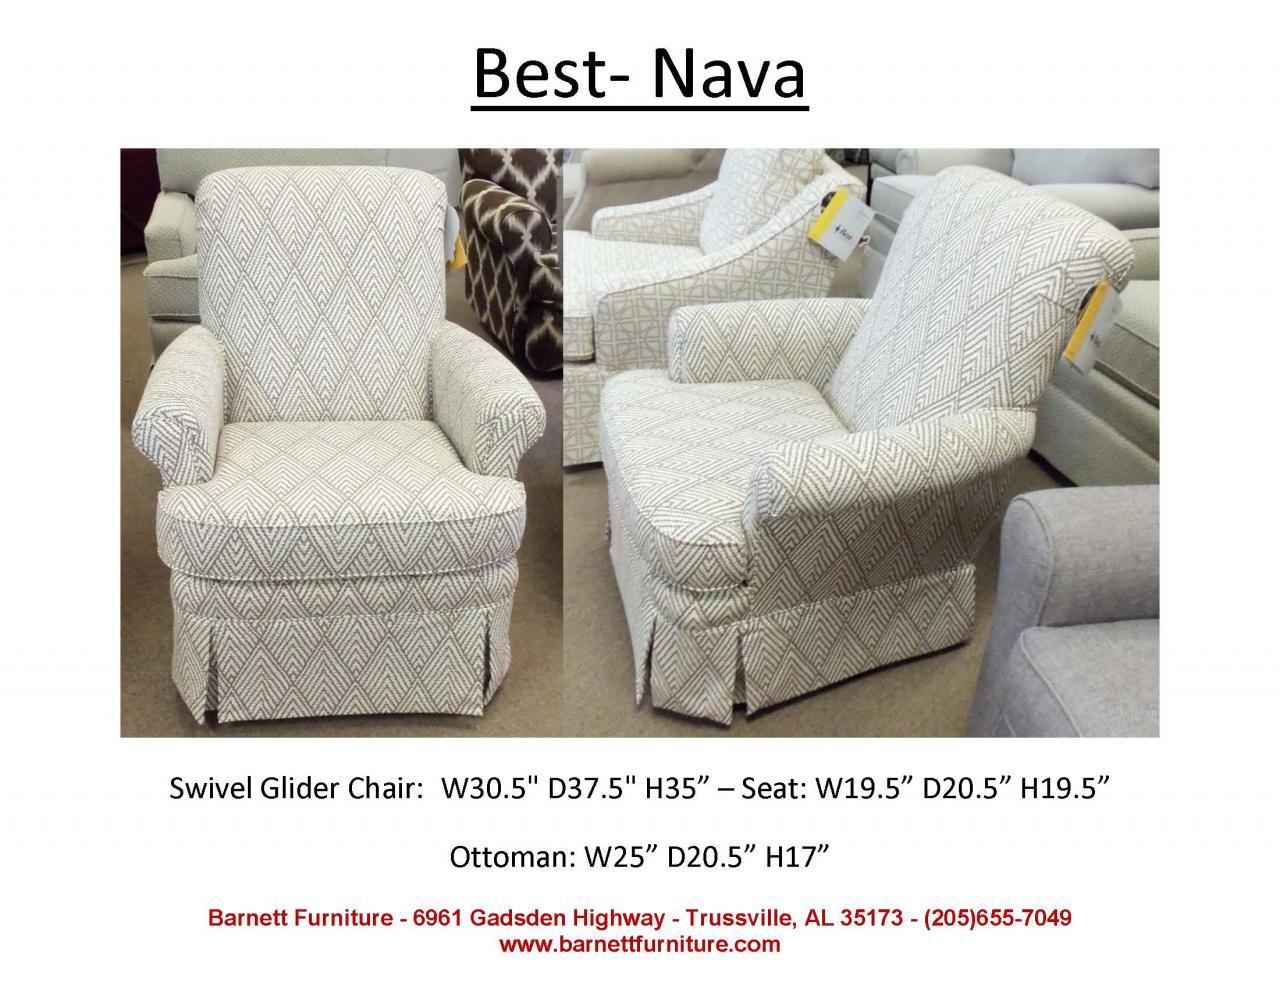 ... Swivel Glider · Southern Furniture 4566 · Best Nava ...